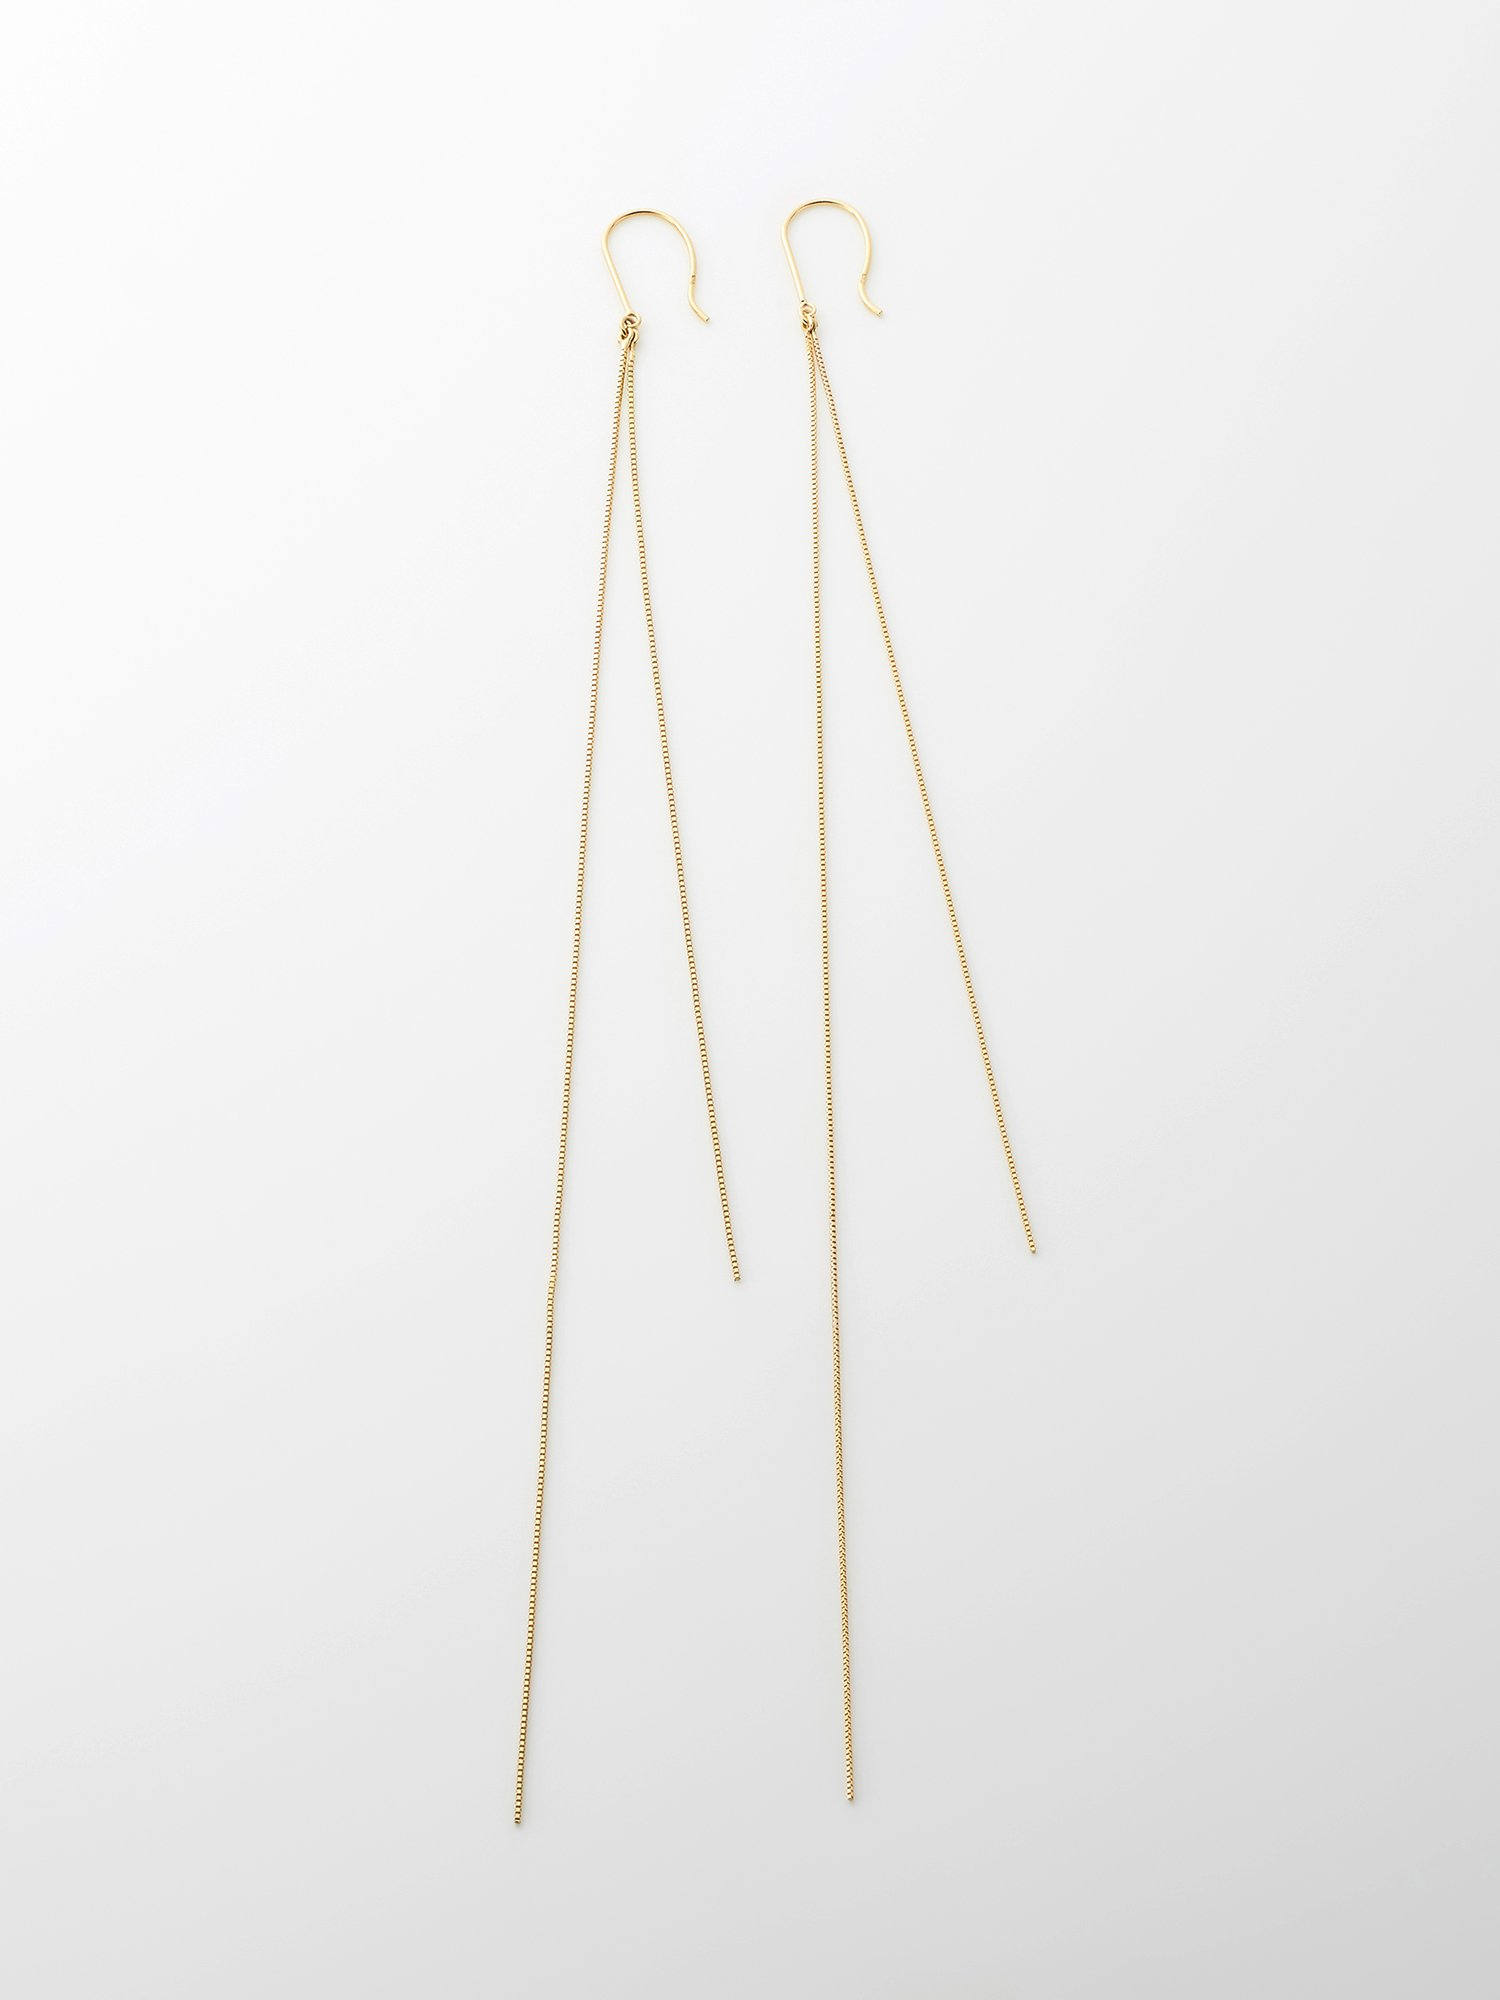 SOPHISTICATED VINTAGE / Gold line earrings / Long